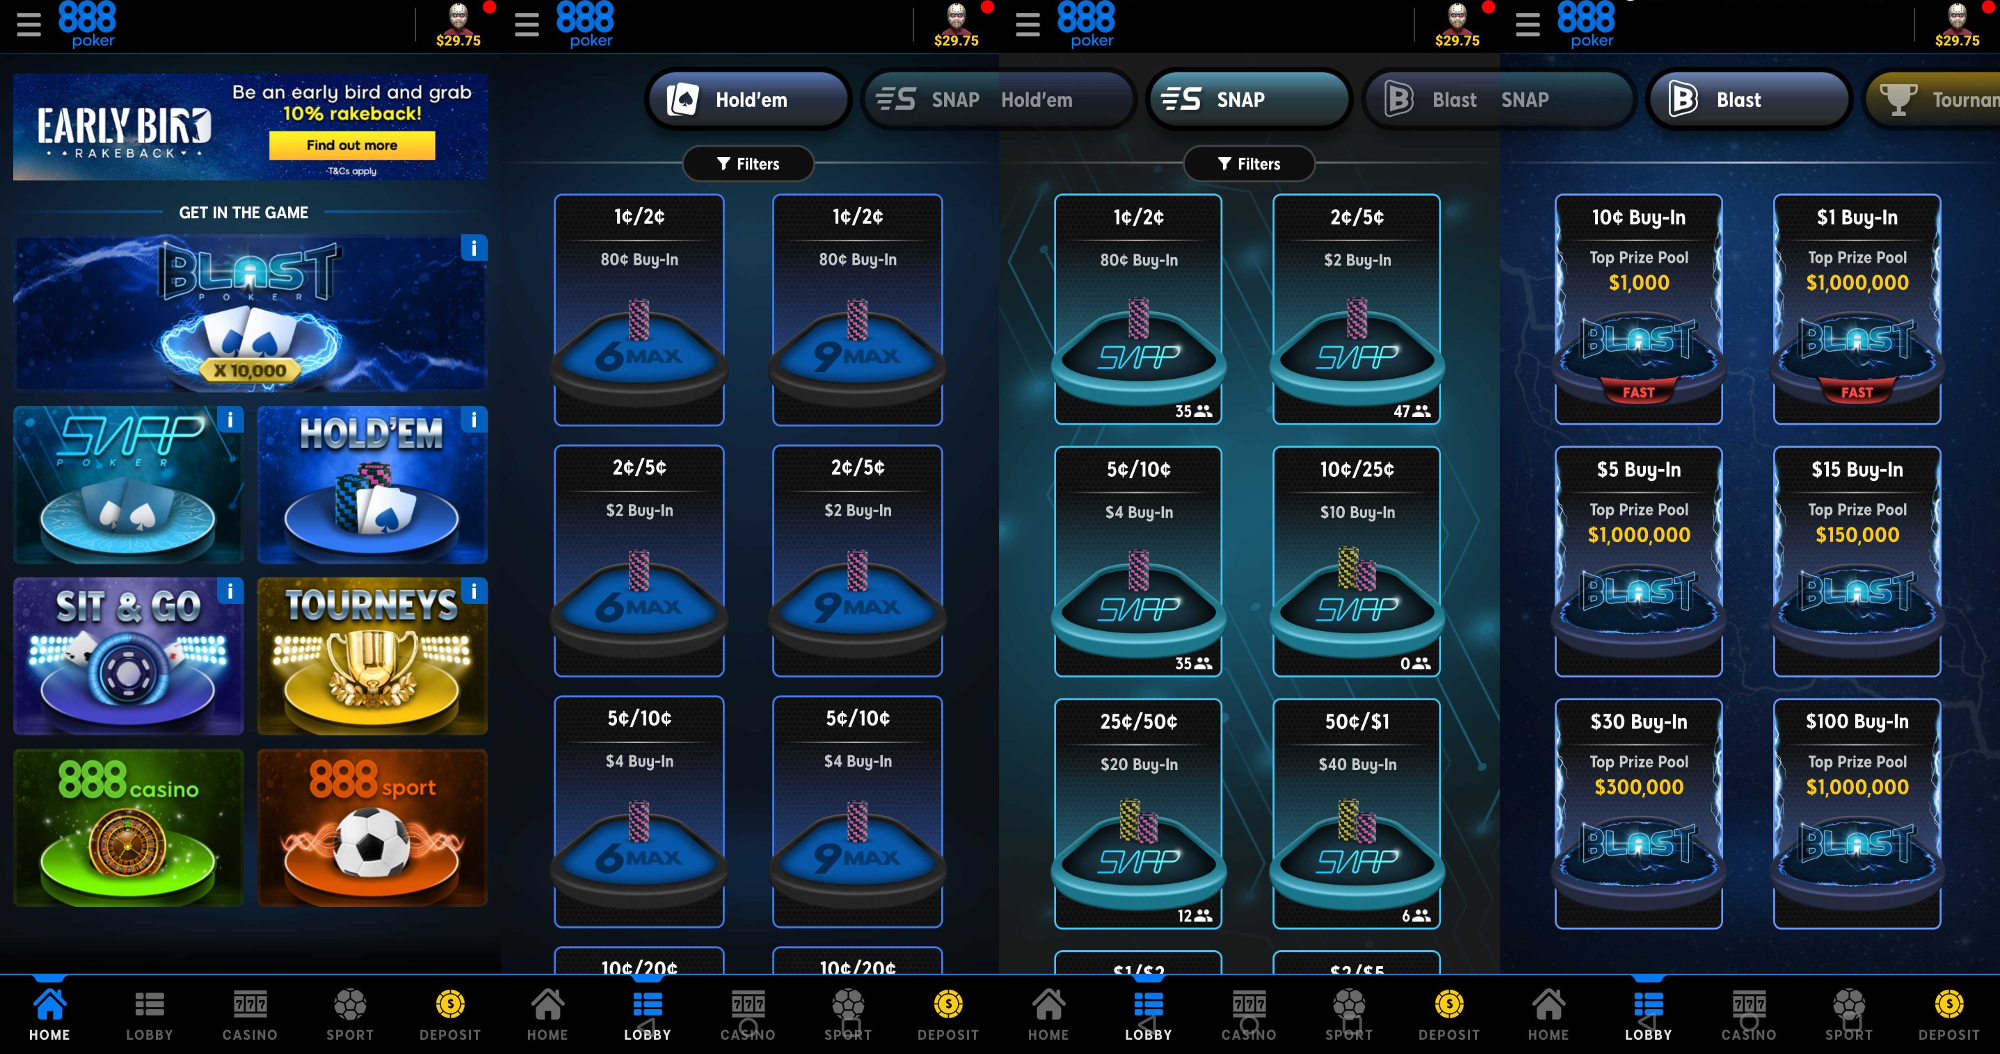 Онлайн покер 888 для андроид реально ли заработать онлайн казино